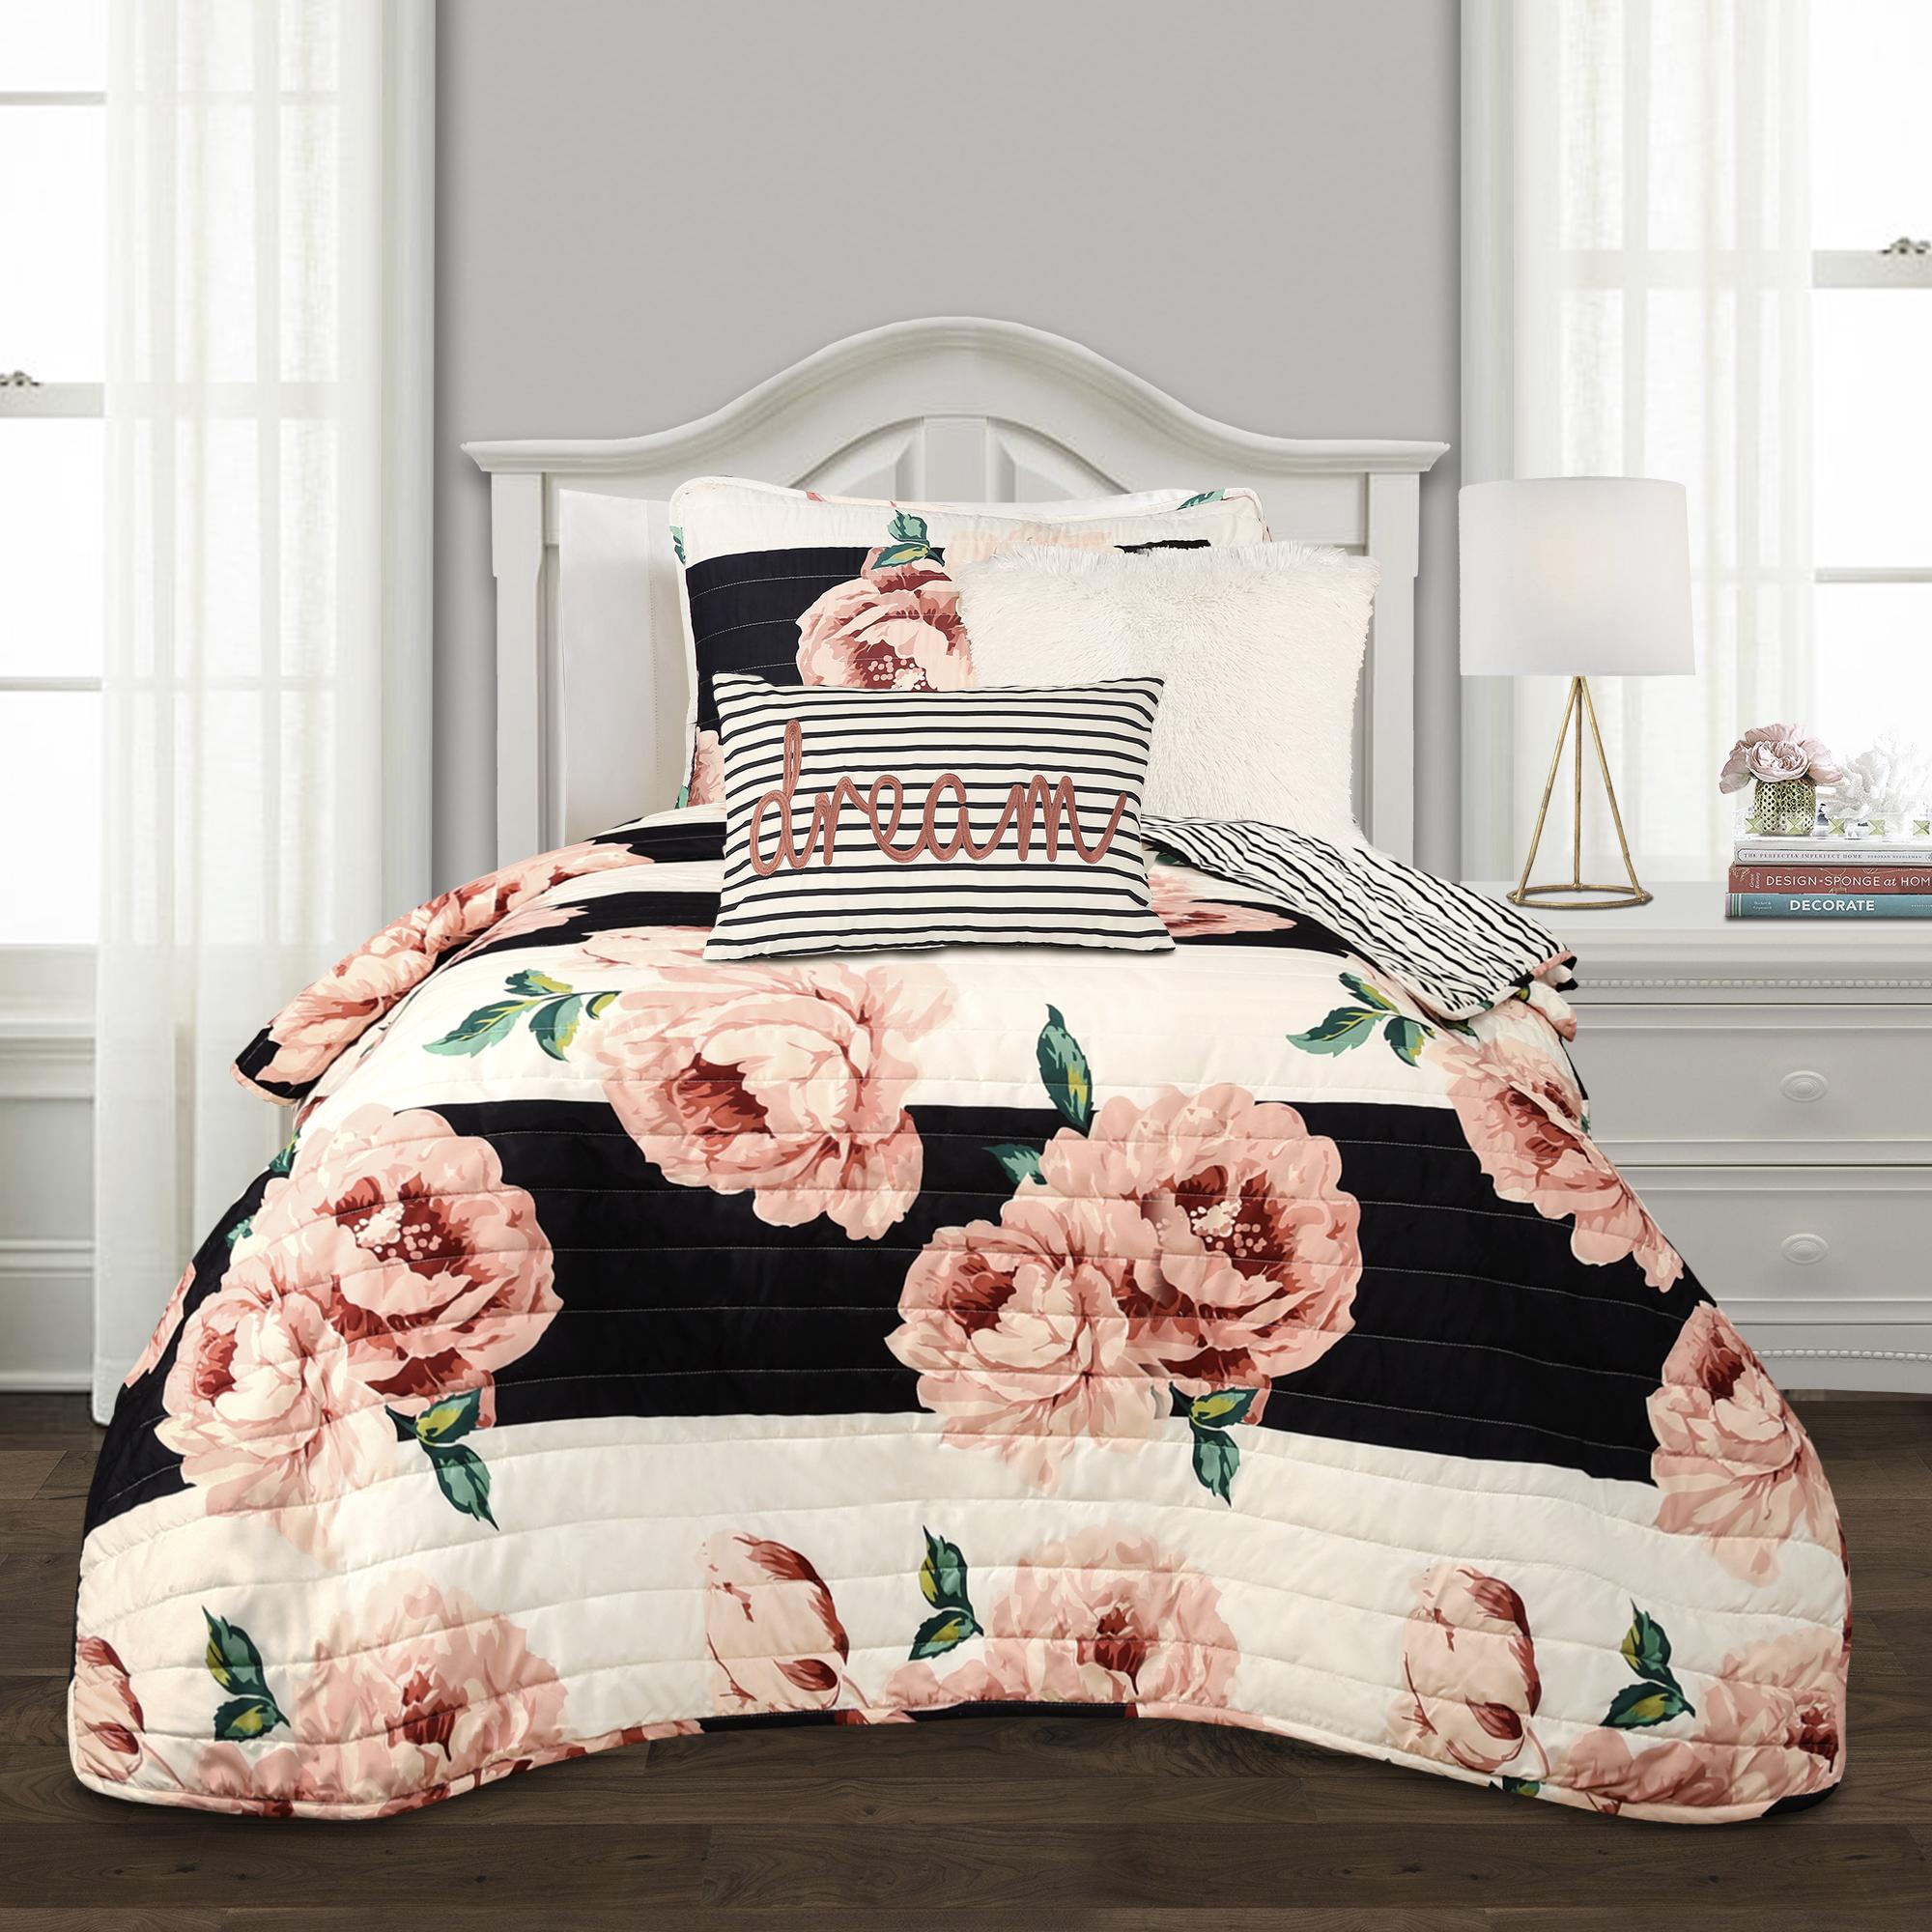 Amara Floral 4-Piece Quilt Set